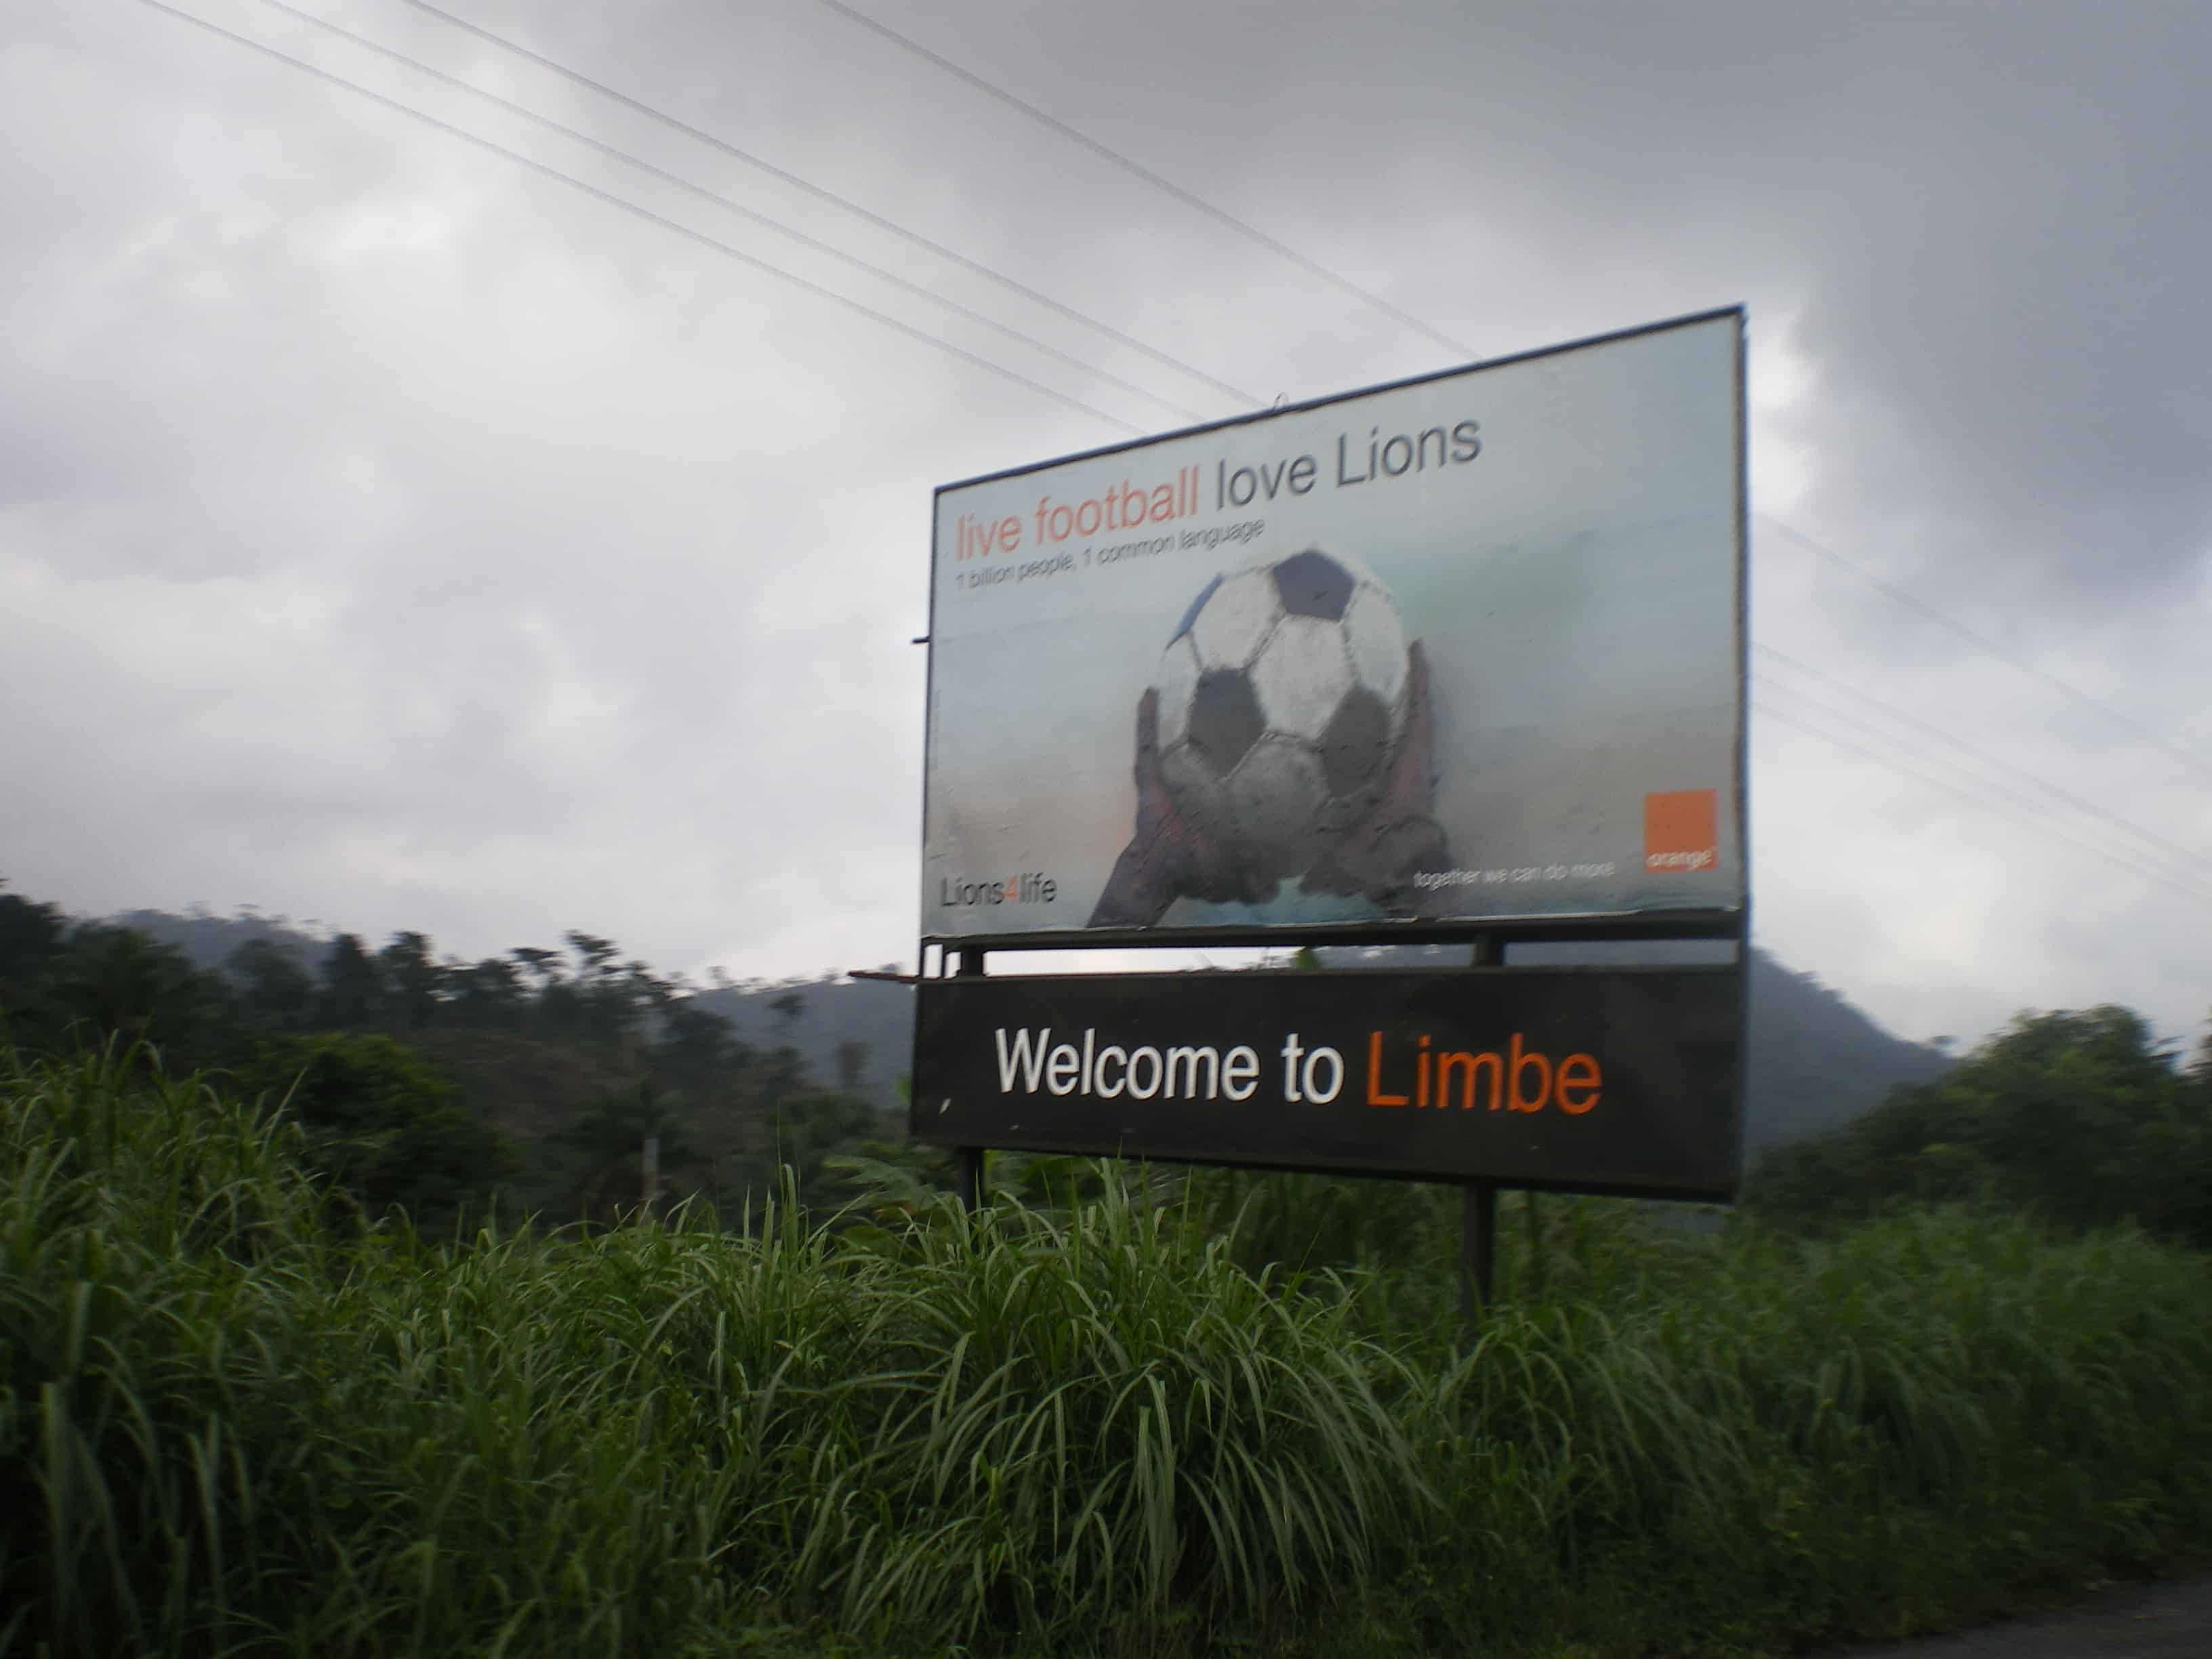 Vacances LIMBE 17 07 10 suite 025